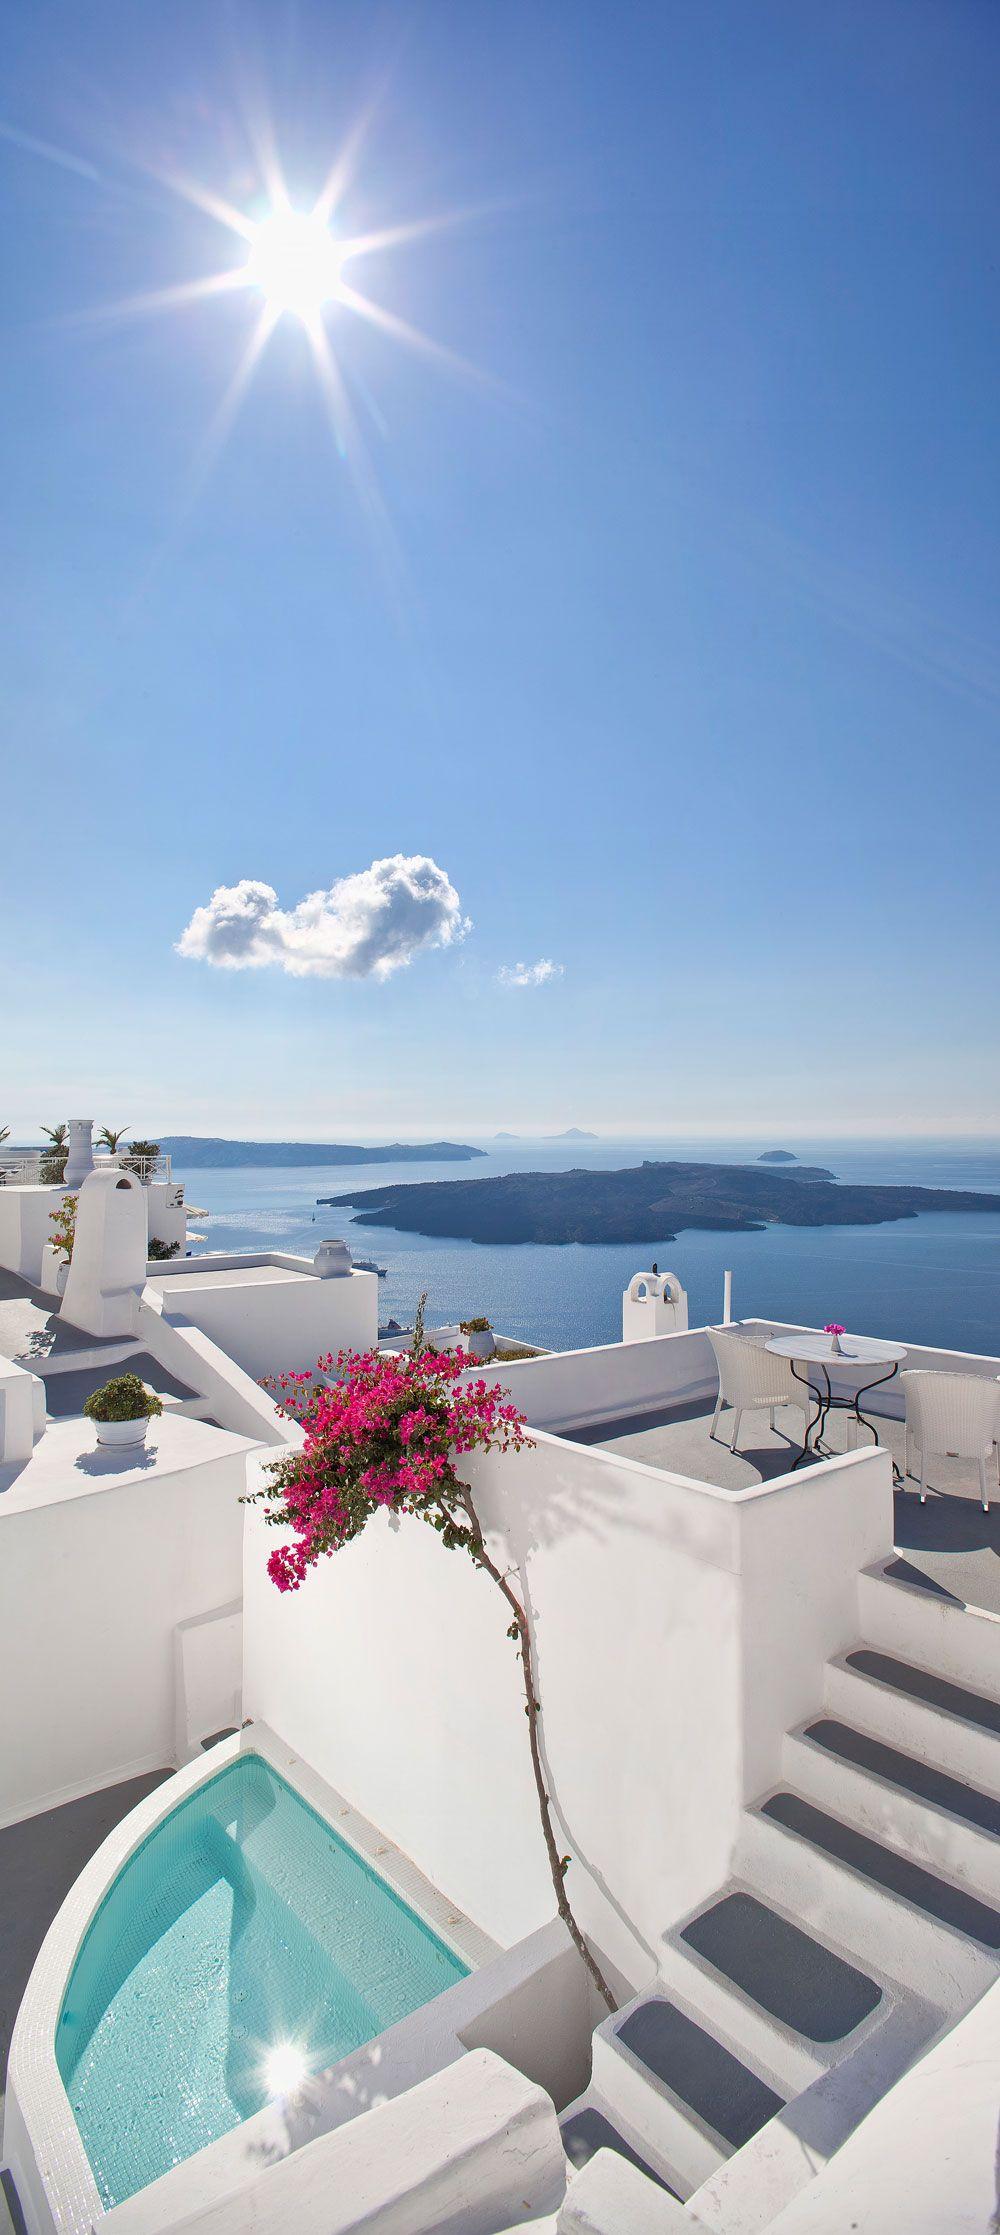 Santorini Greece Cliff Side Hotel Suites In Firostefani